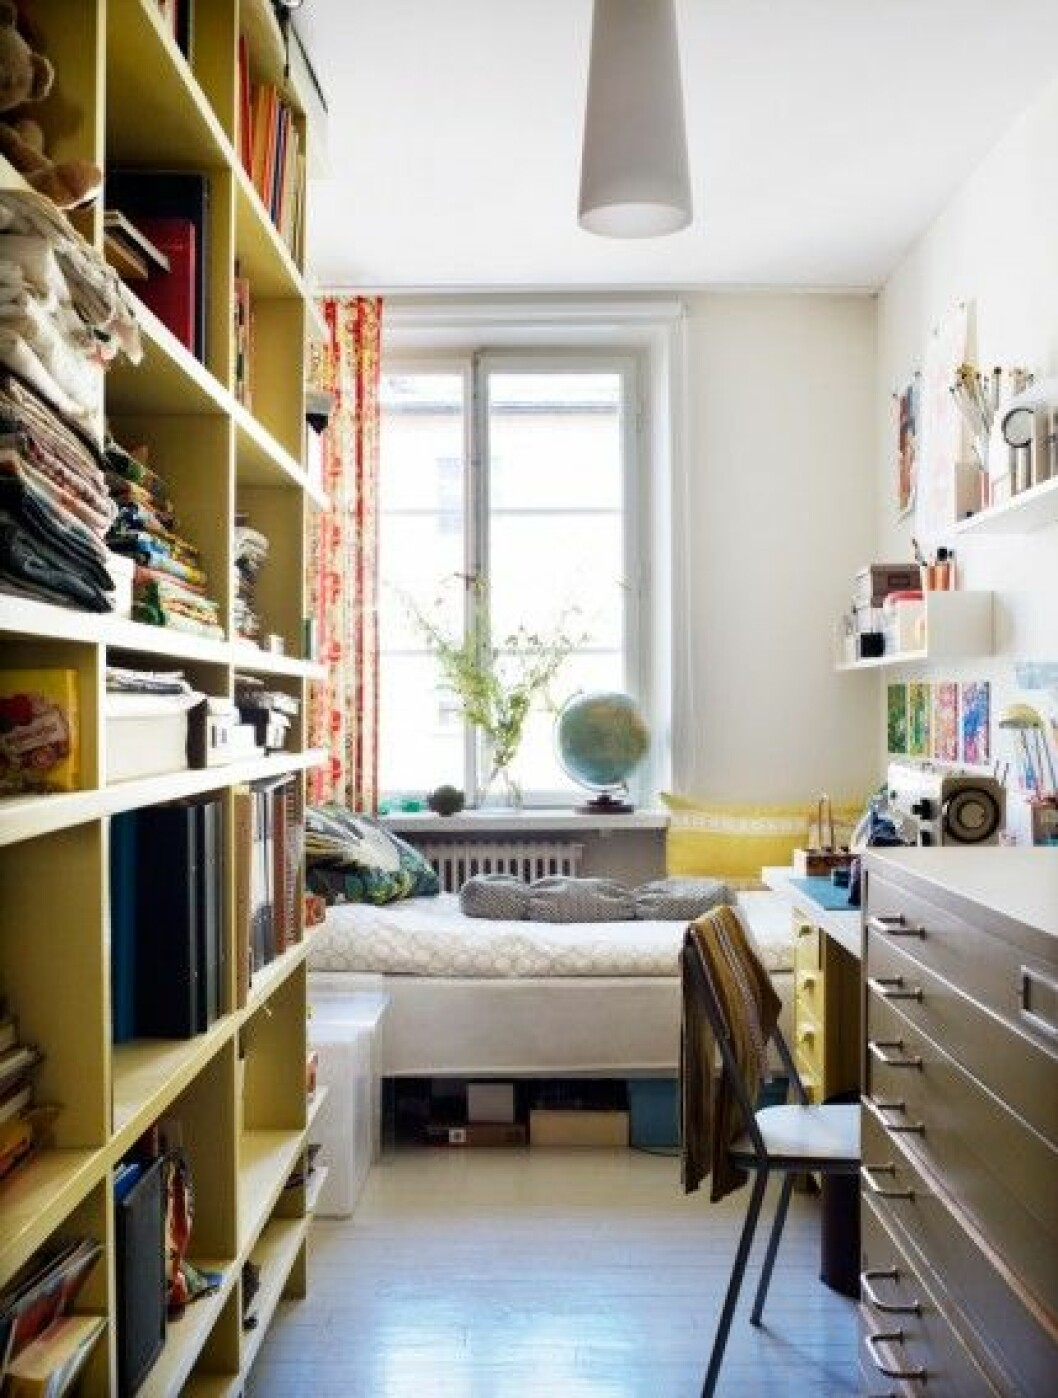 barnrum-bokhylla-skrivbord-inspiration-foto-Patric-Johansson